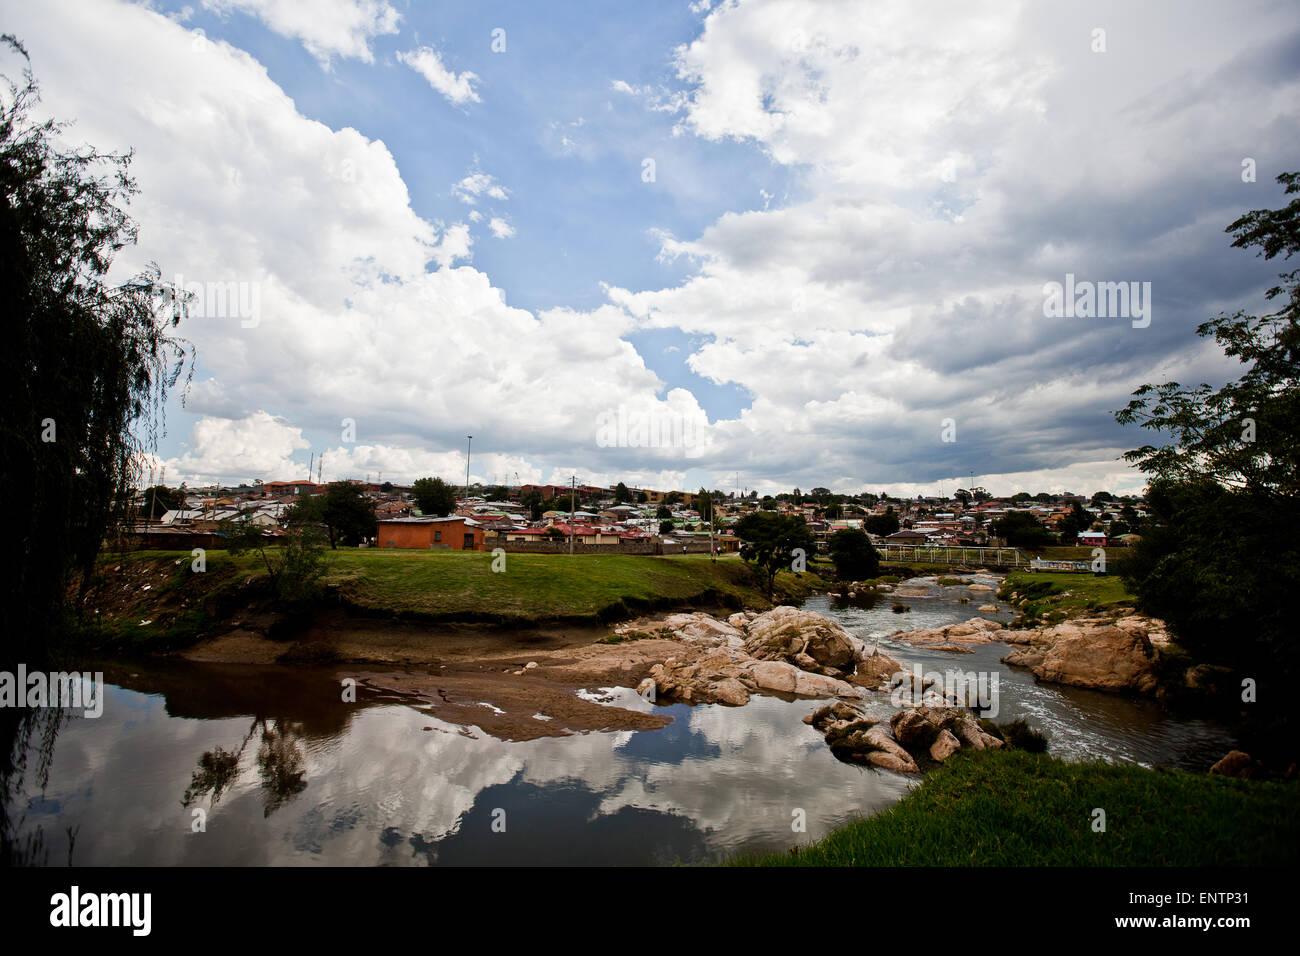 Alexandra township di Johannesburg, Sud Africa: Immagini Stock